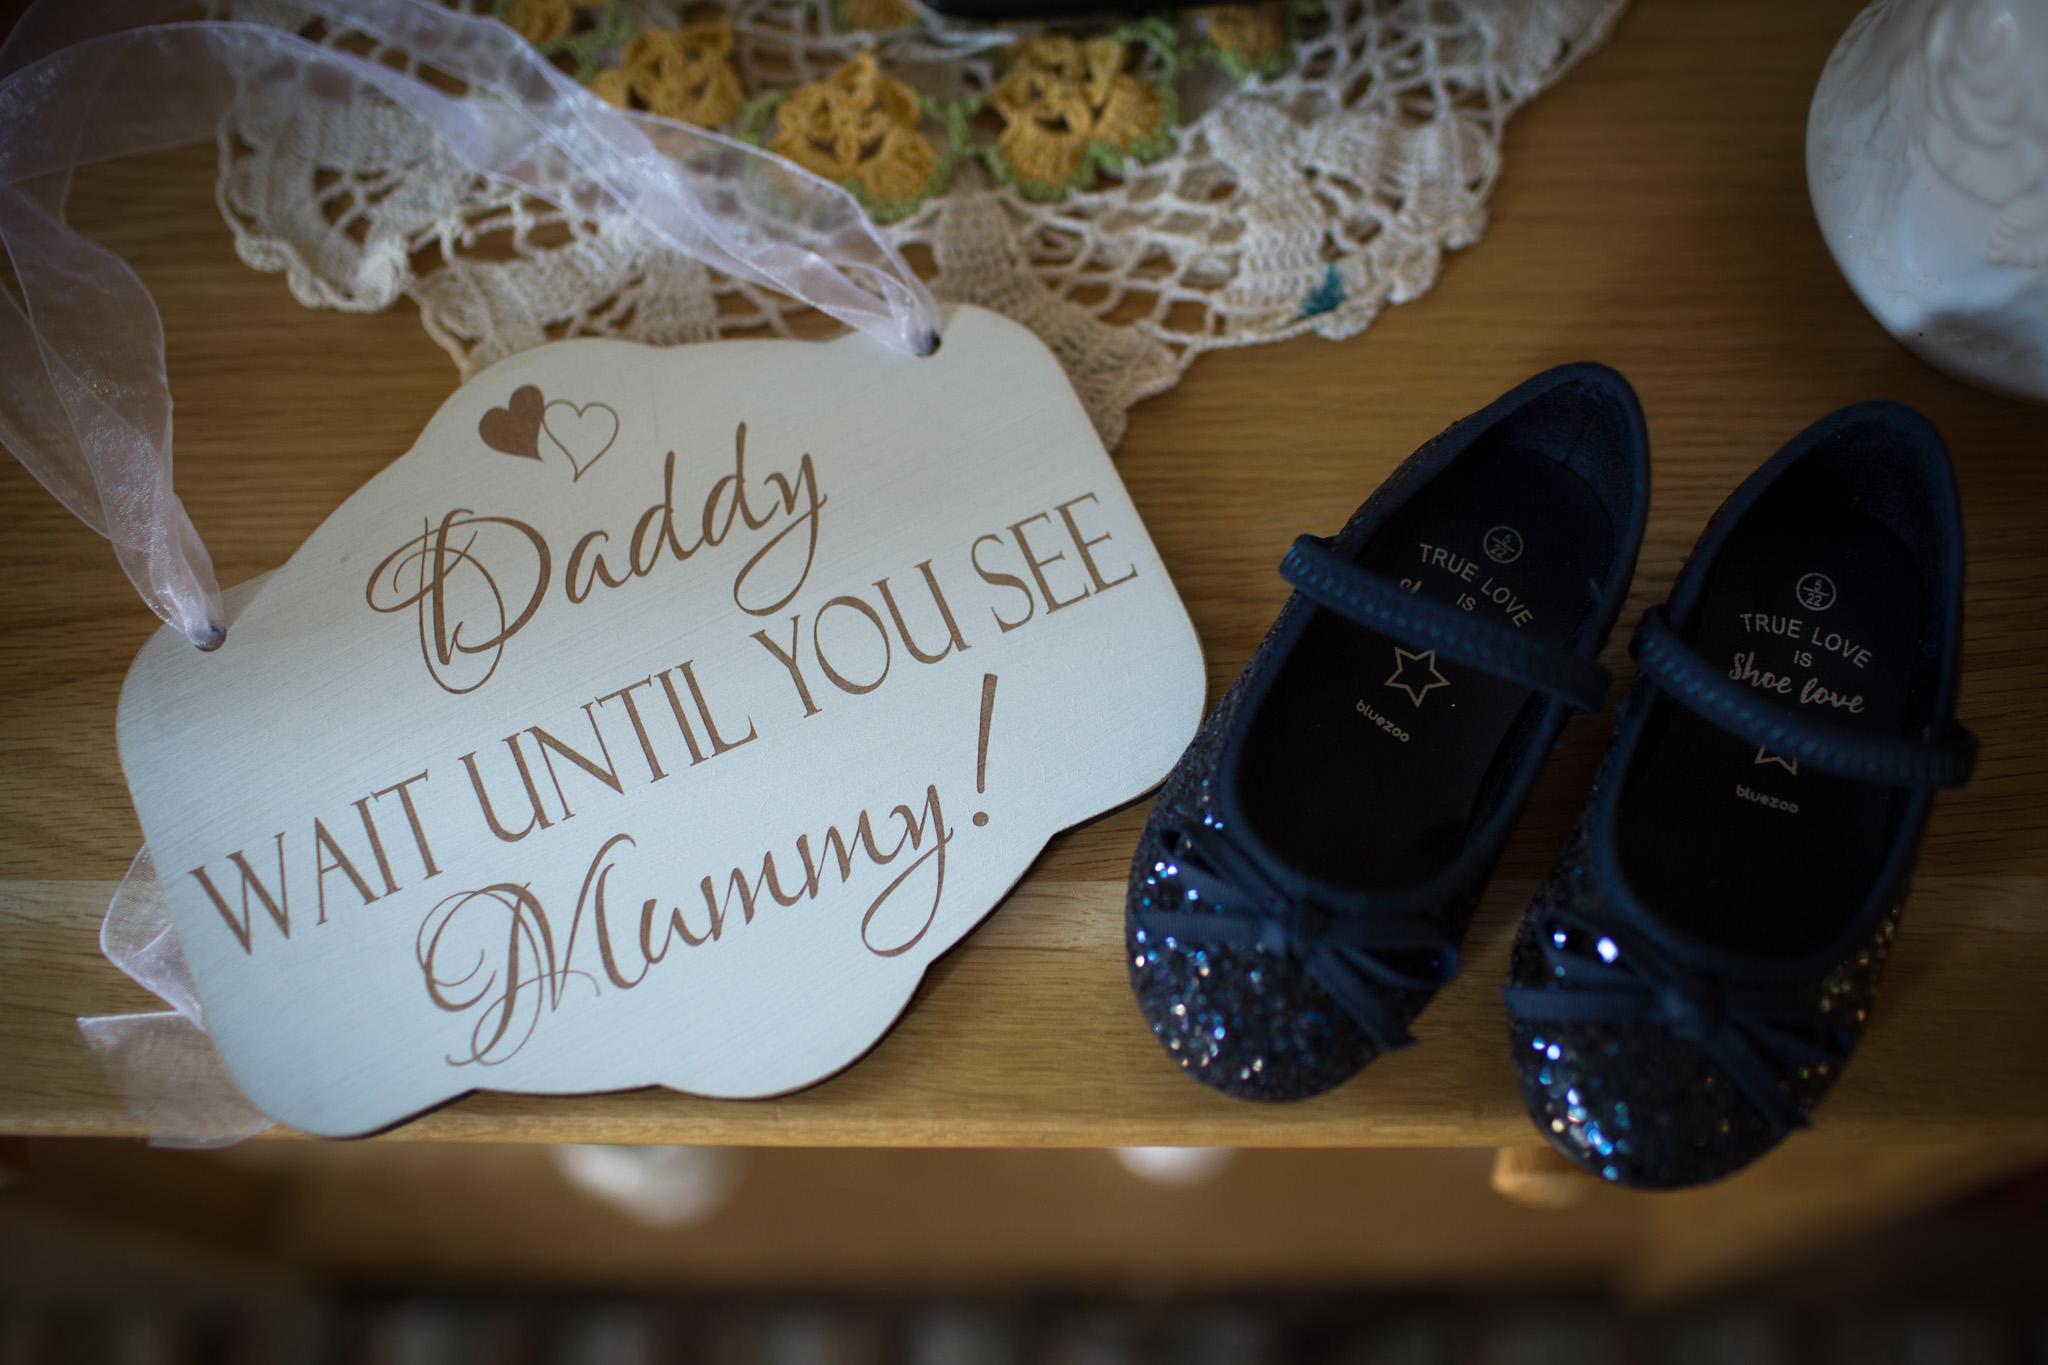 Mark_Barnes_Northern_Ireland_Wedding_Photography_Marine_hotel_ballycastle_Wedding_Photography_Janet&Darren-3.jpg